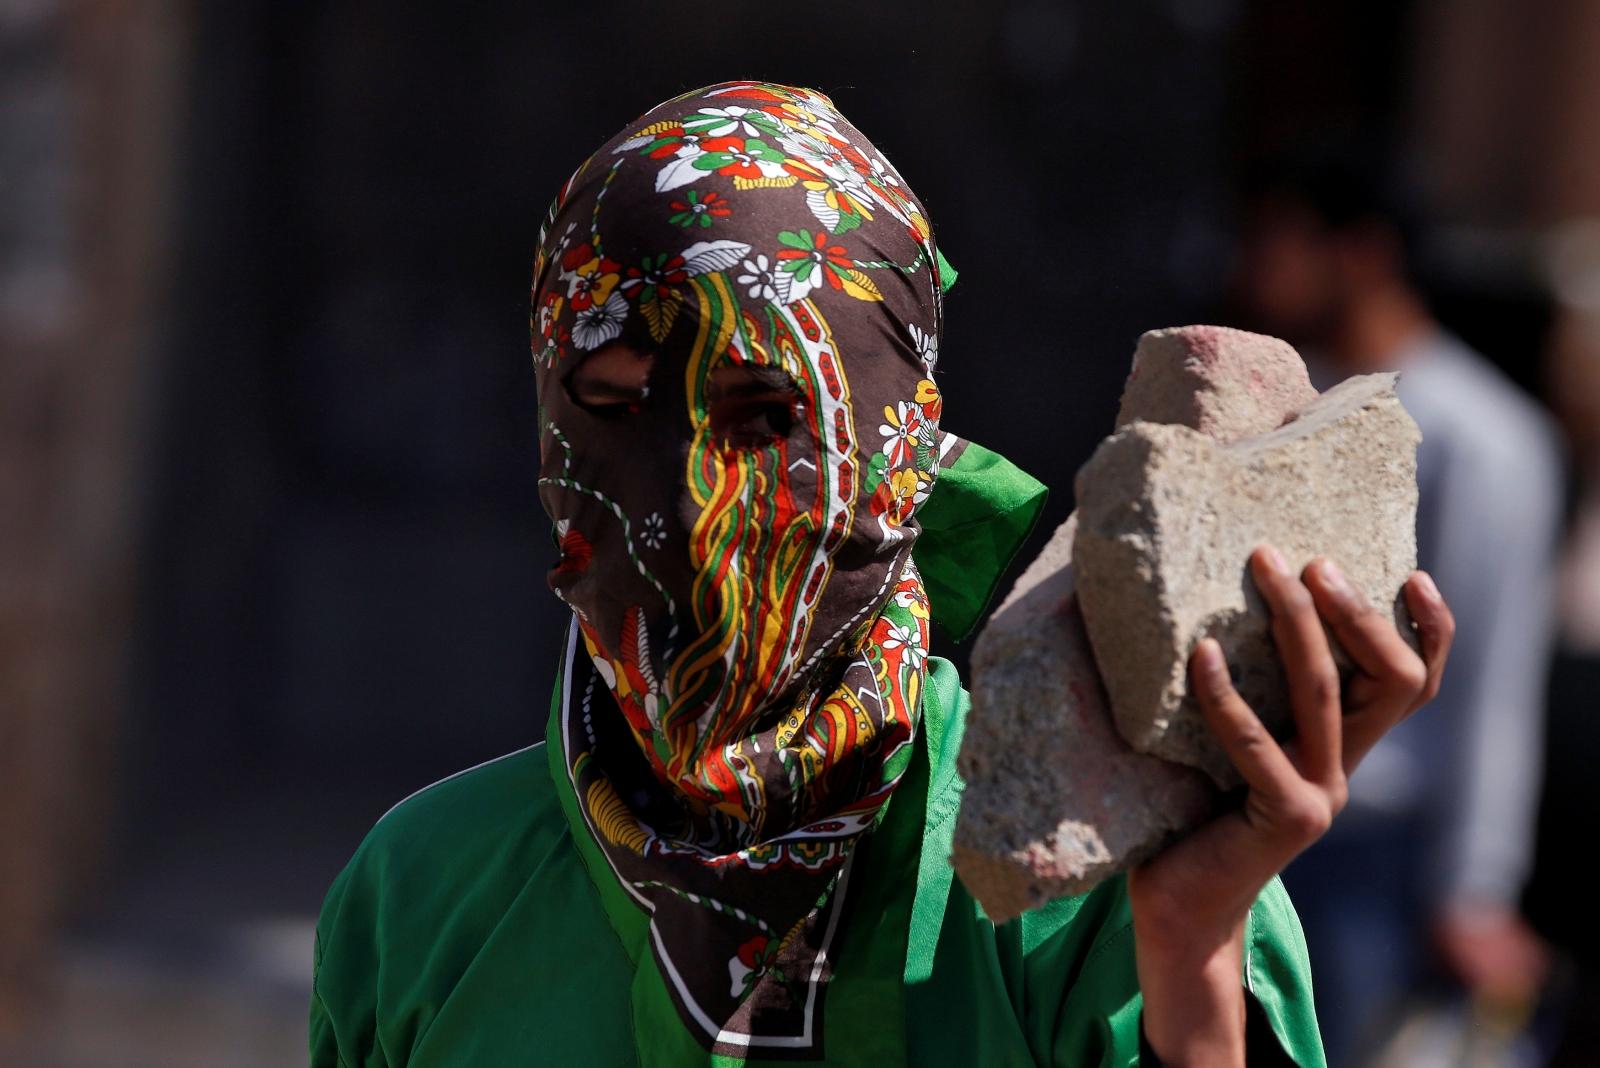 Indian Kashmir under Ramadan curfew after rebel leader's killing